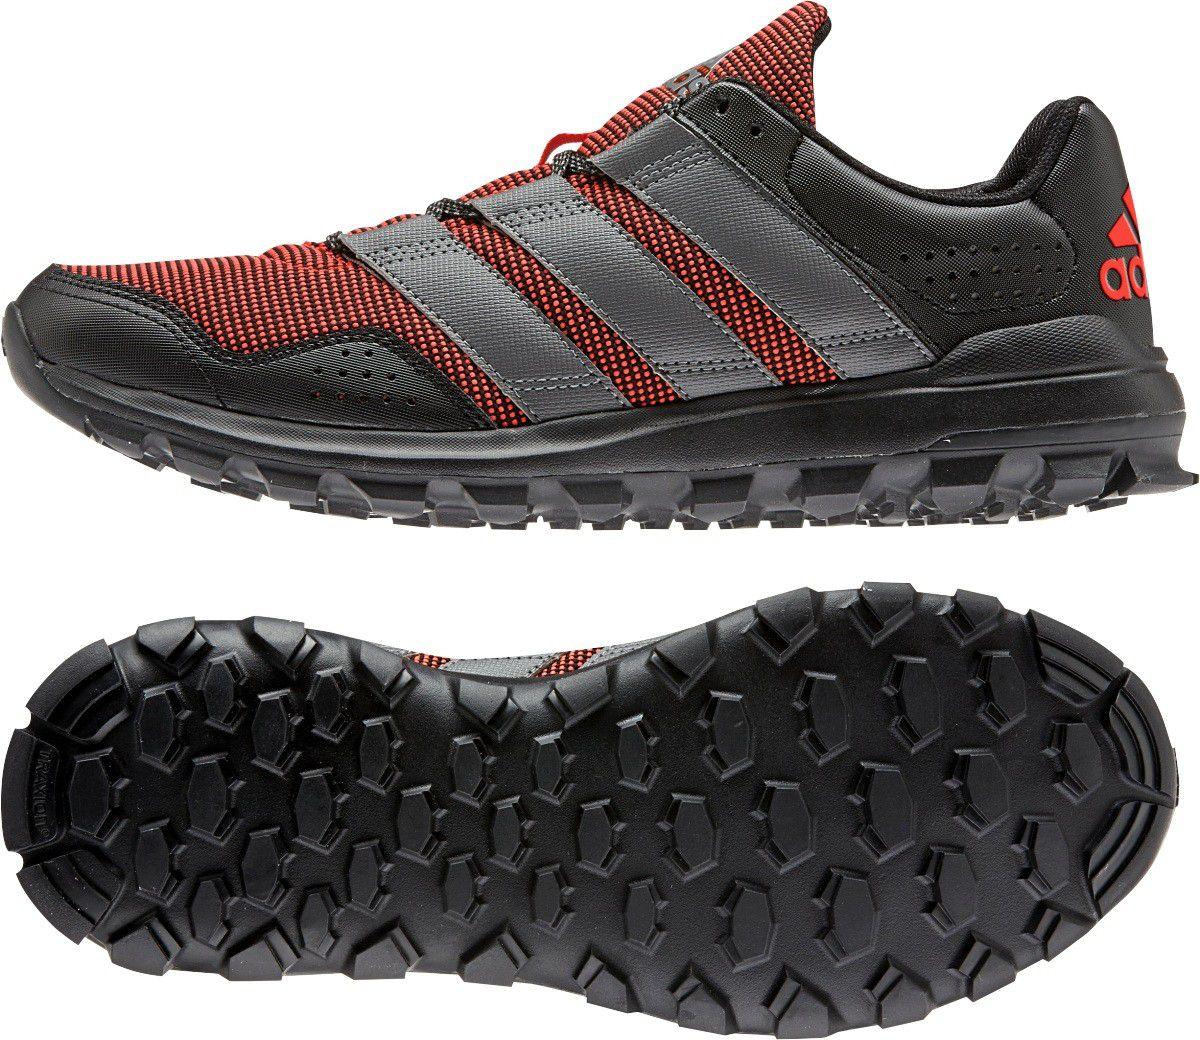 Hombres Adidas tirachinas TR Trail corriendo zapatos buy online in South